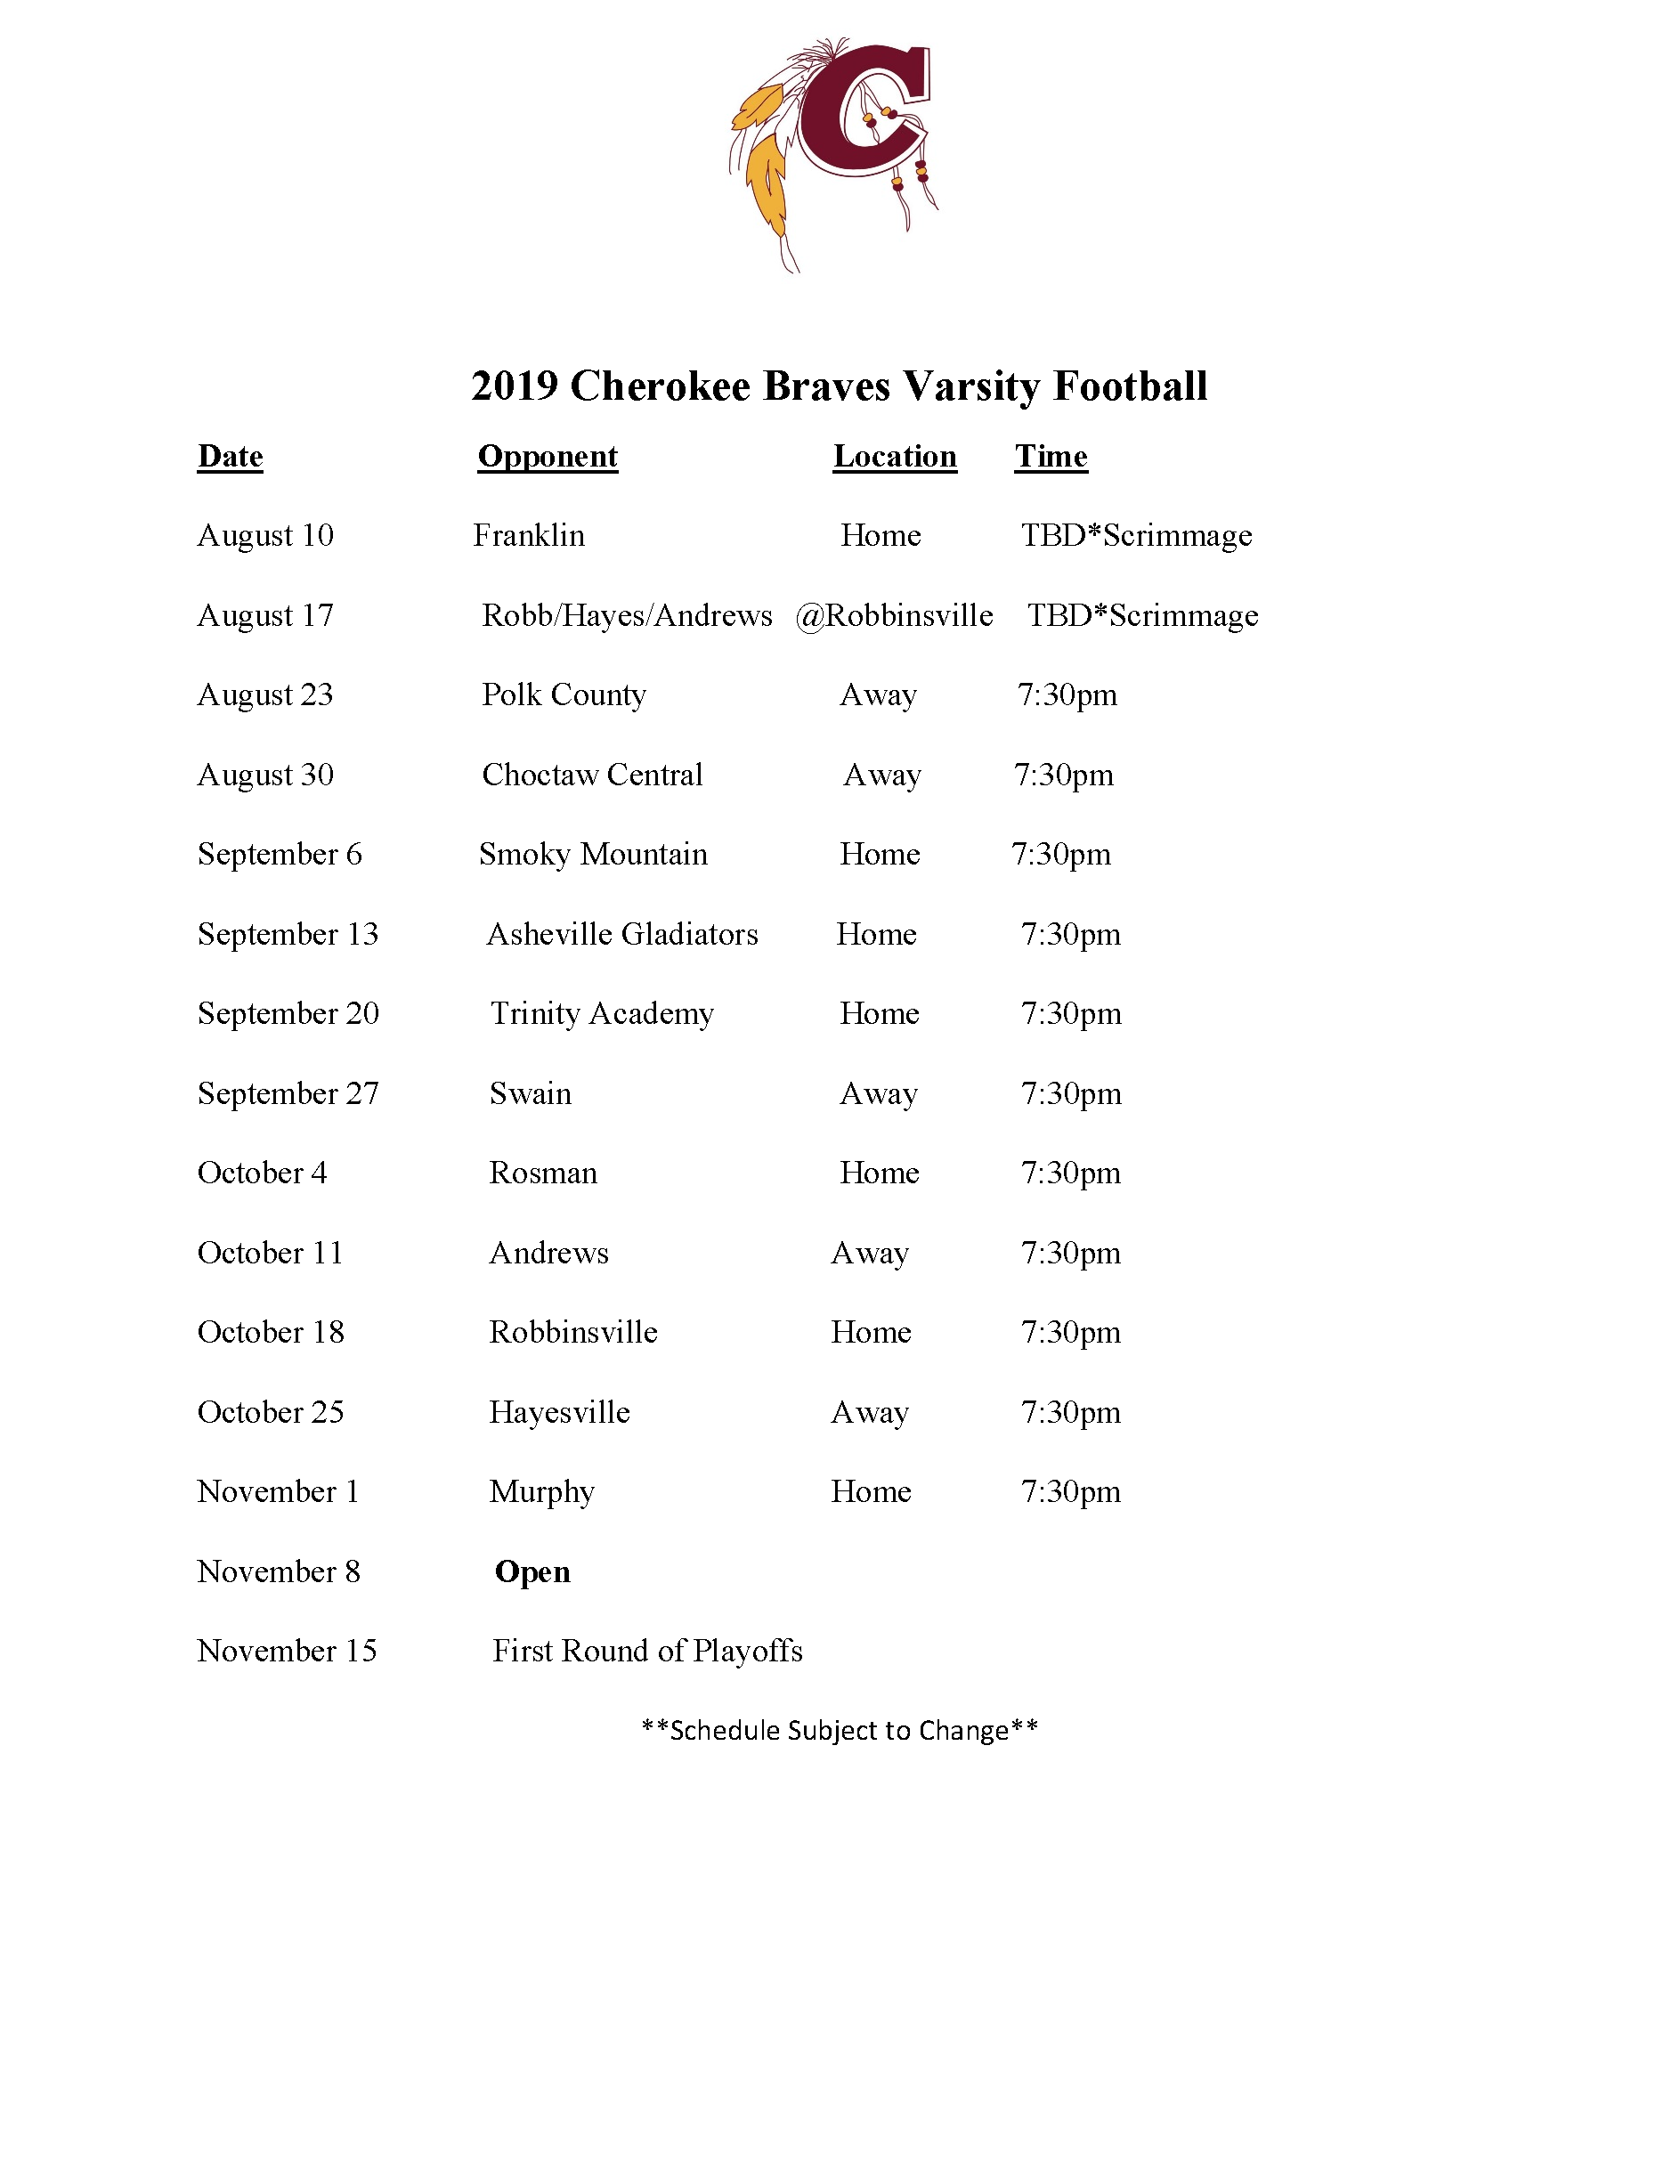 2019-2020 Football Schedule